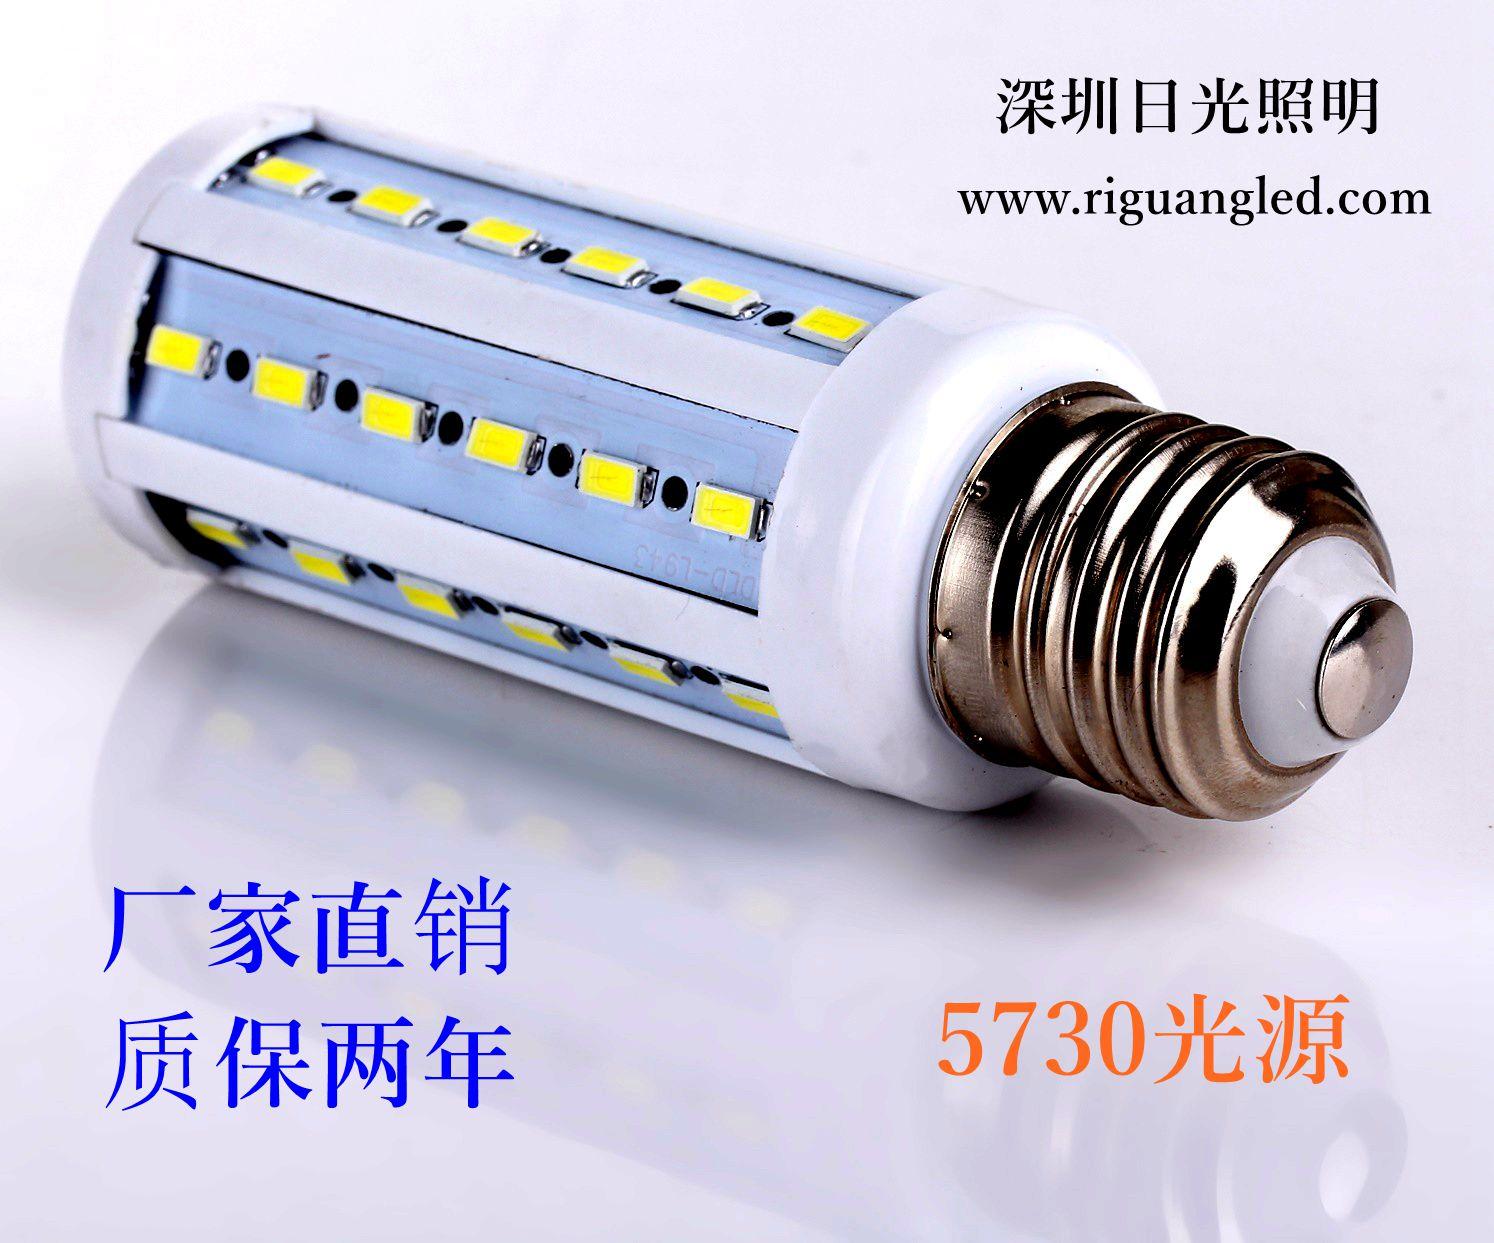 Miser lamp energy-saving lamp LED light warm yellow light energy saving lighting corn lamp 10We27 small screw mouth lled